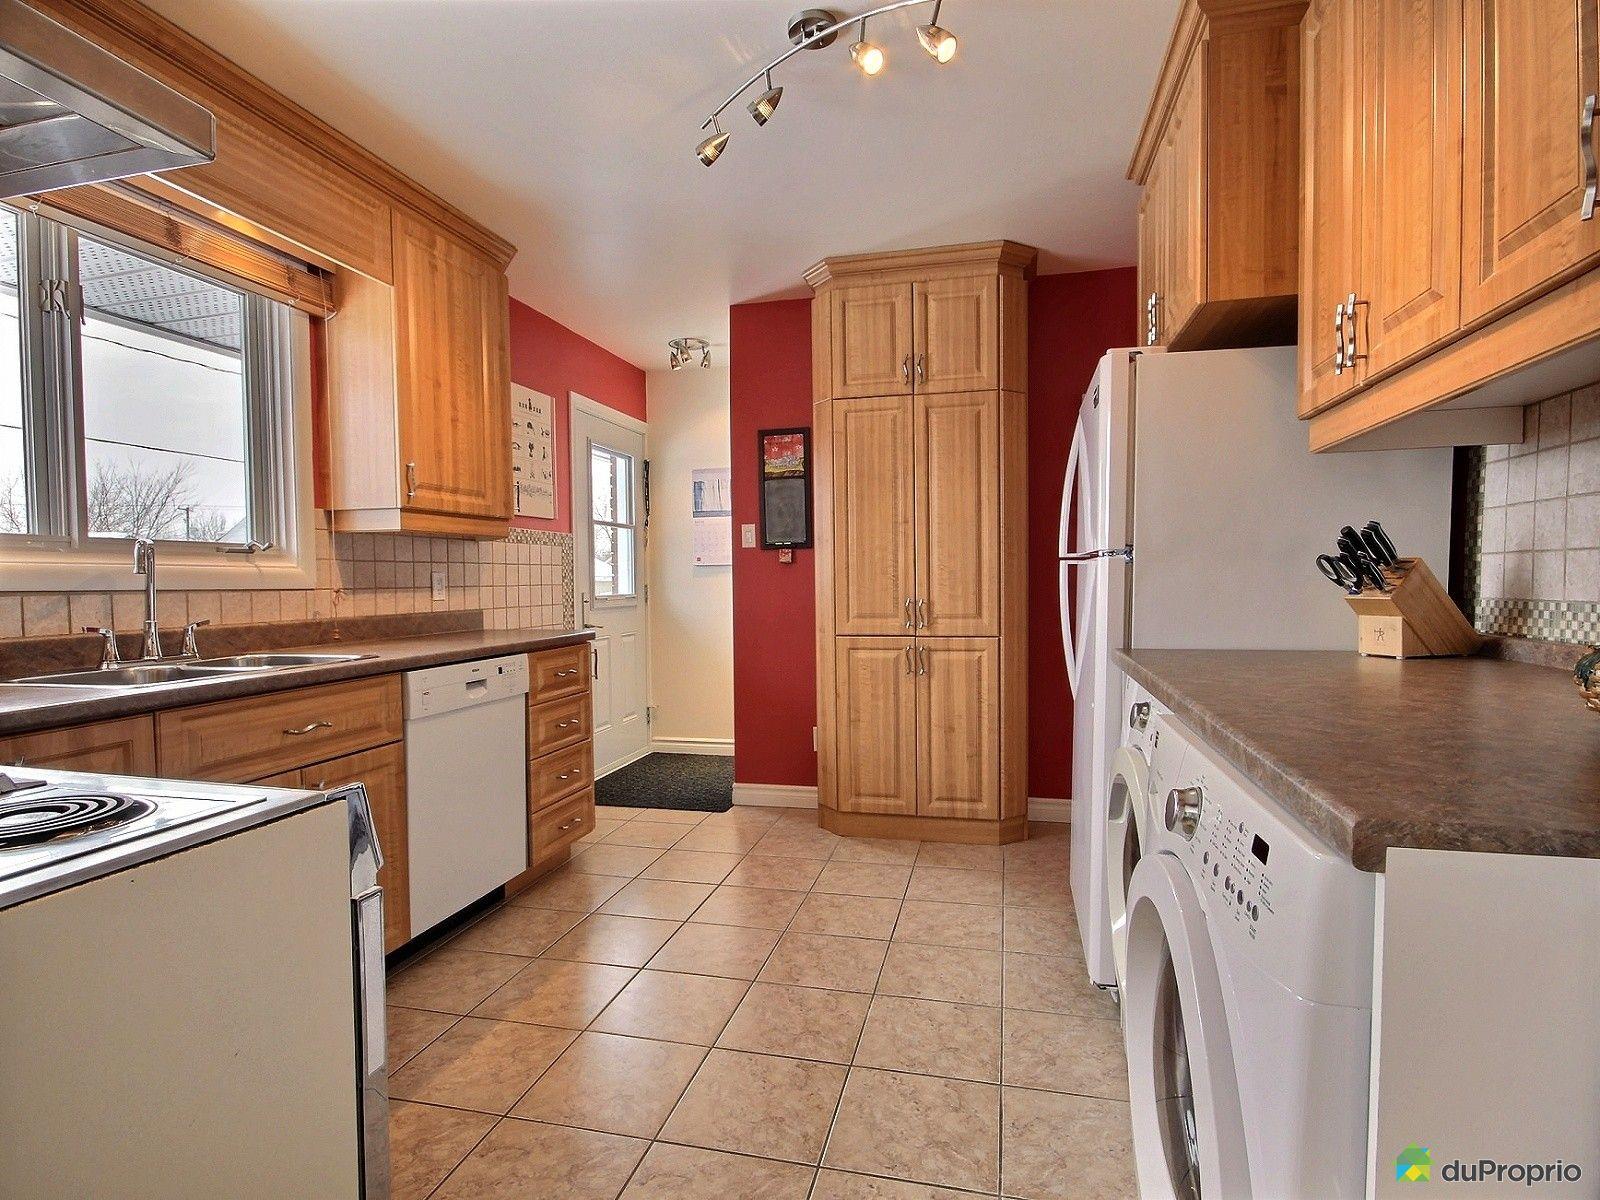 Maison vendre gatineau 7 rue marie bernard immobilier for Cuisine gatineau